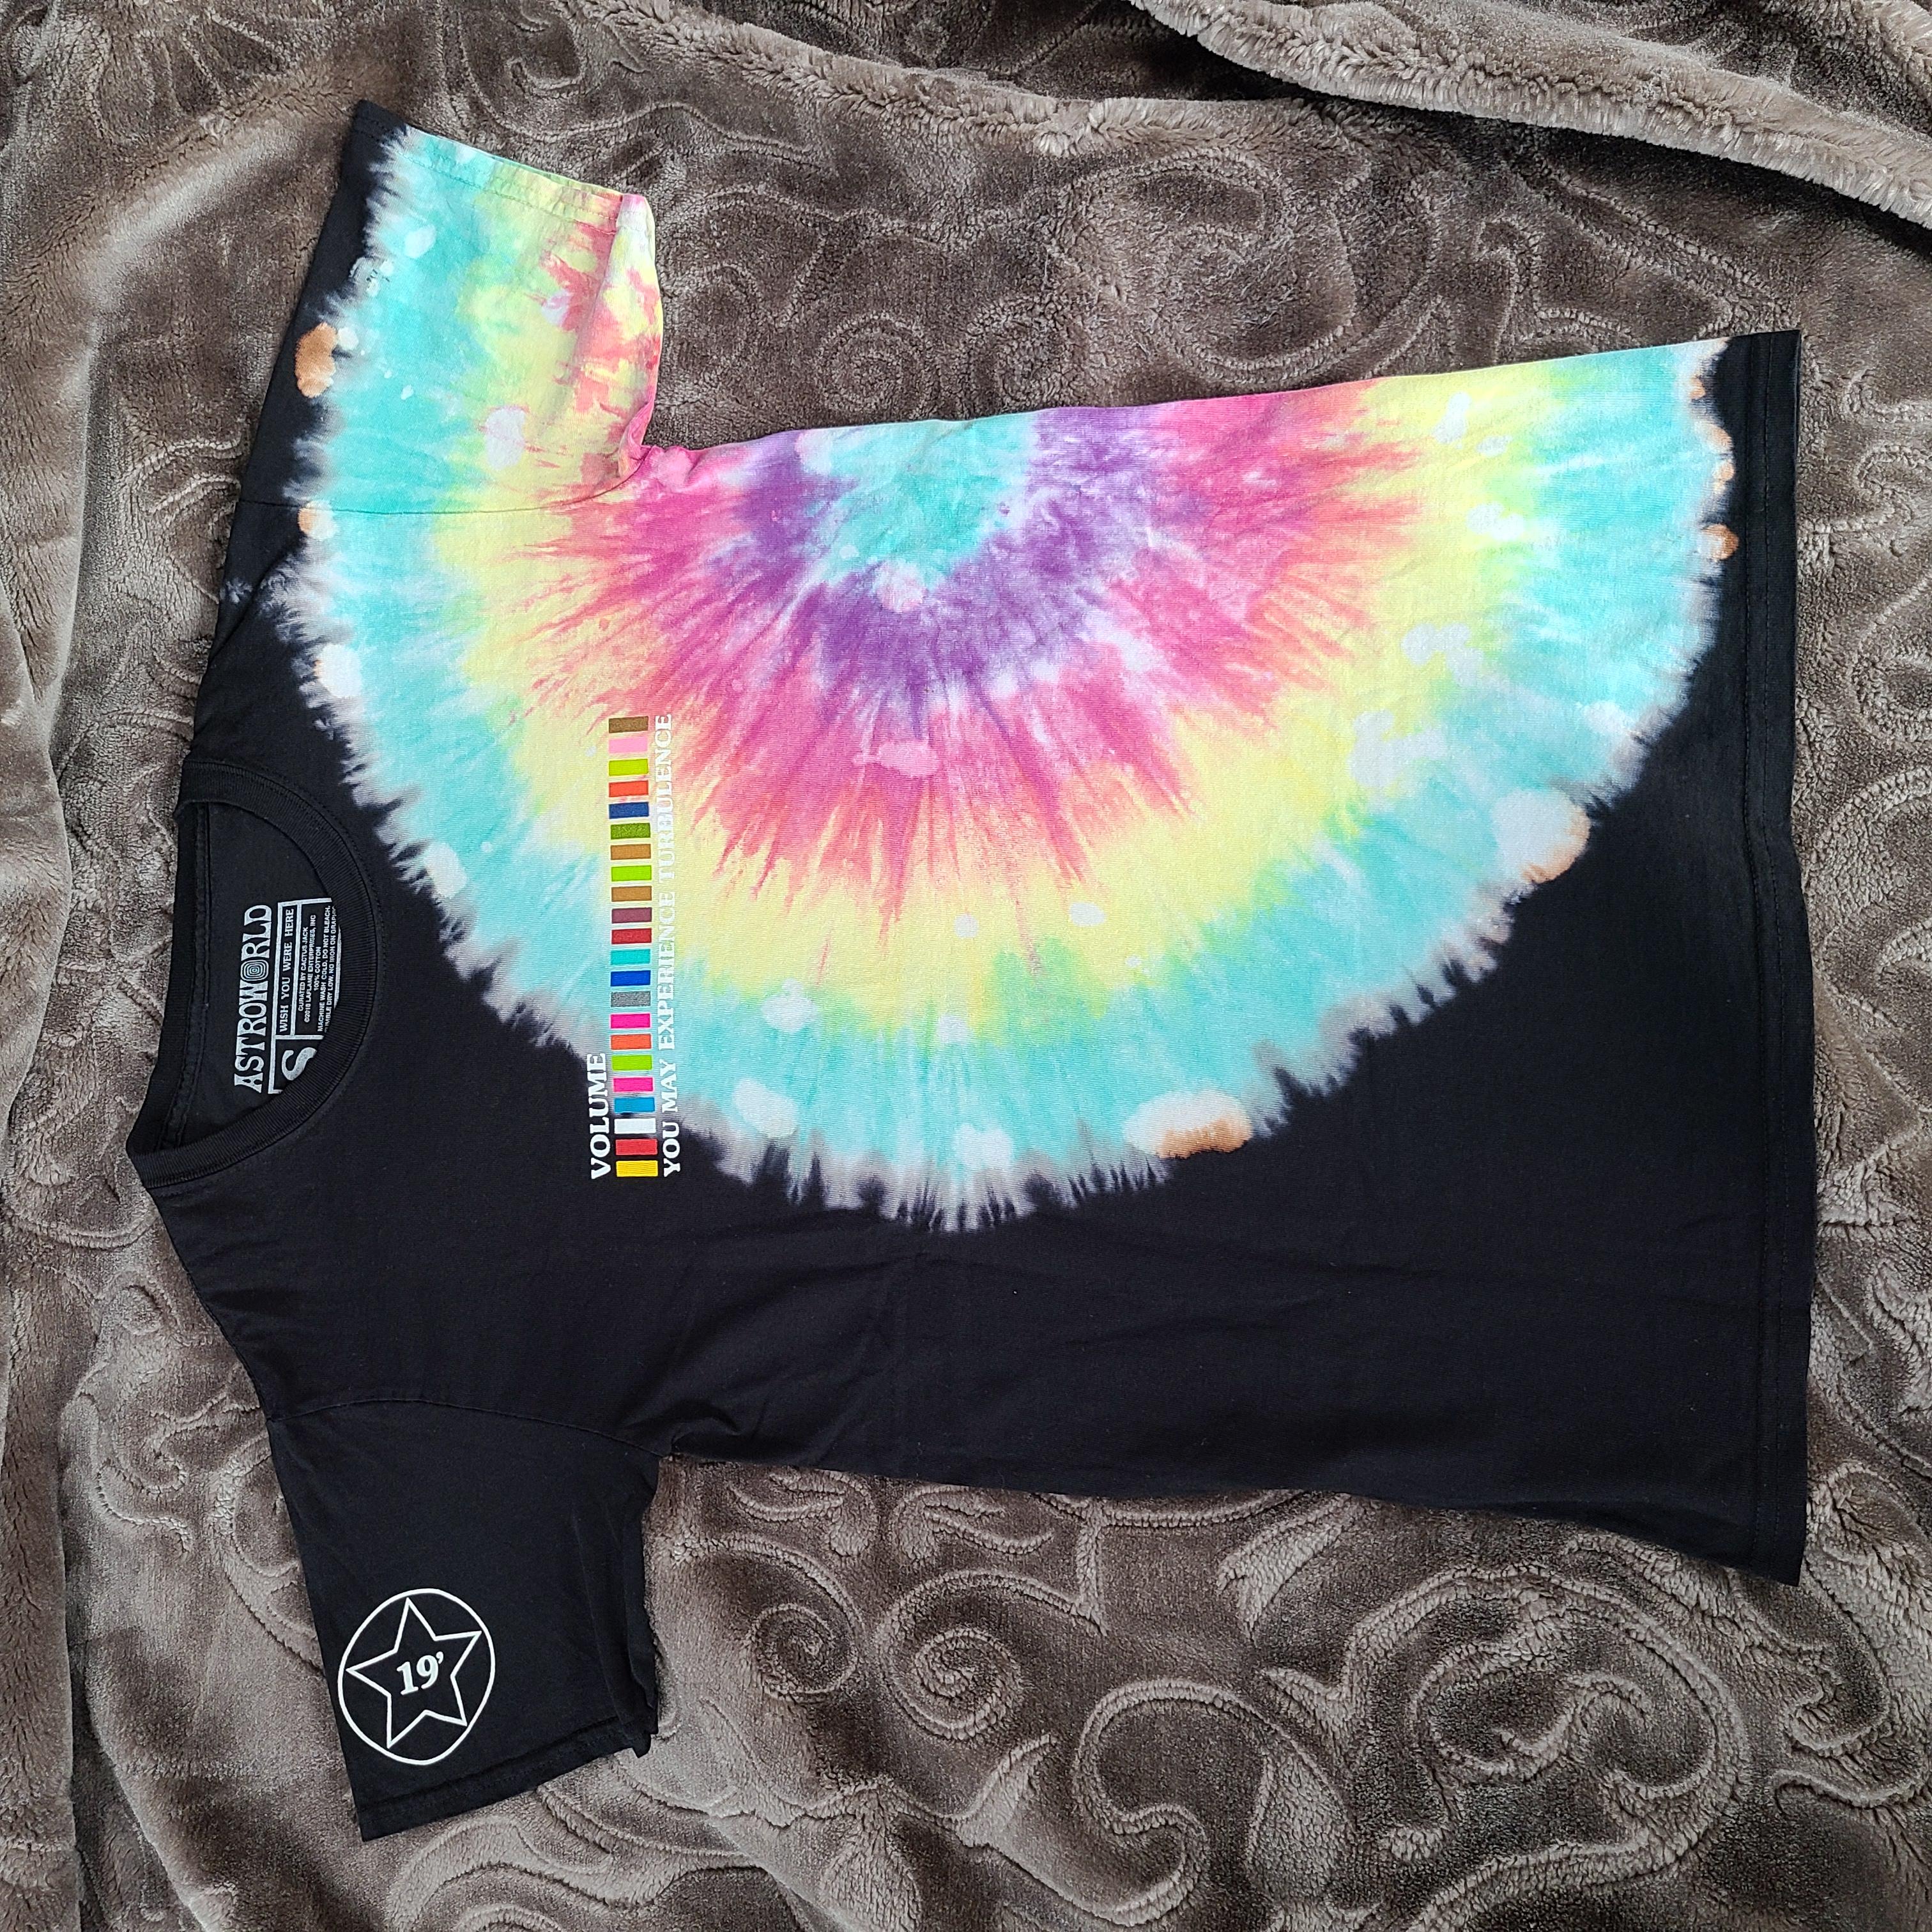 INS Travis Scott Astroworld Festival Run Tie Dye Tee TOUR T-SHIRT Casual Shirt